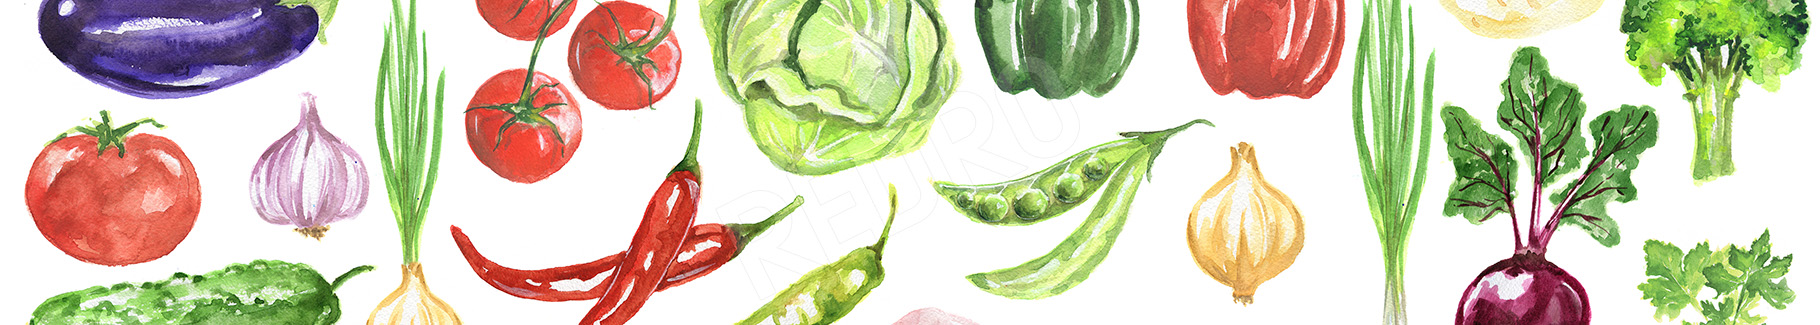 Fototapeta warzywa do kuchni